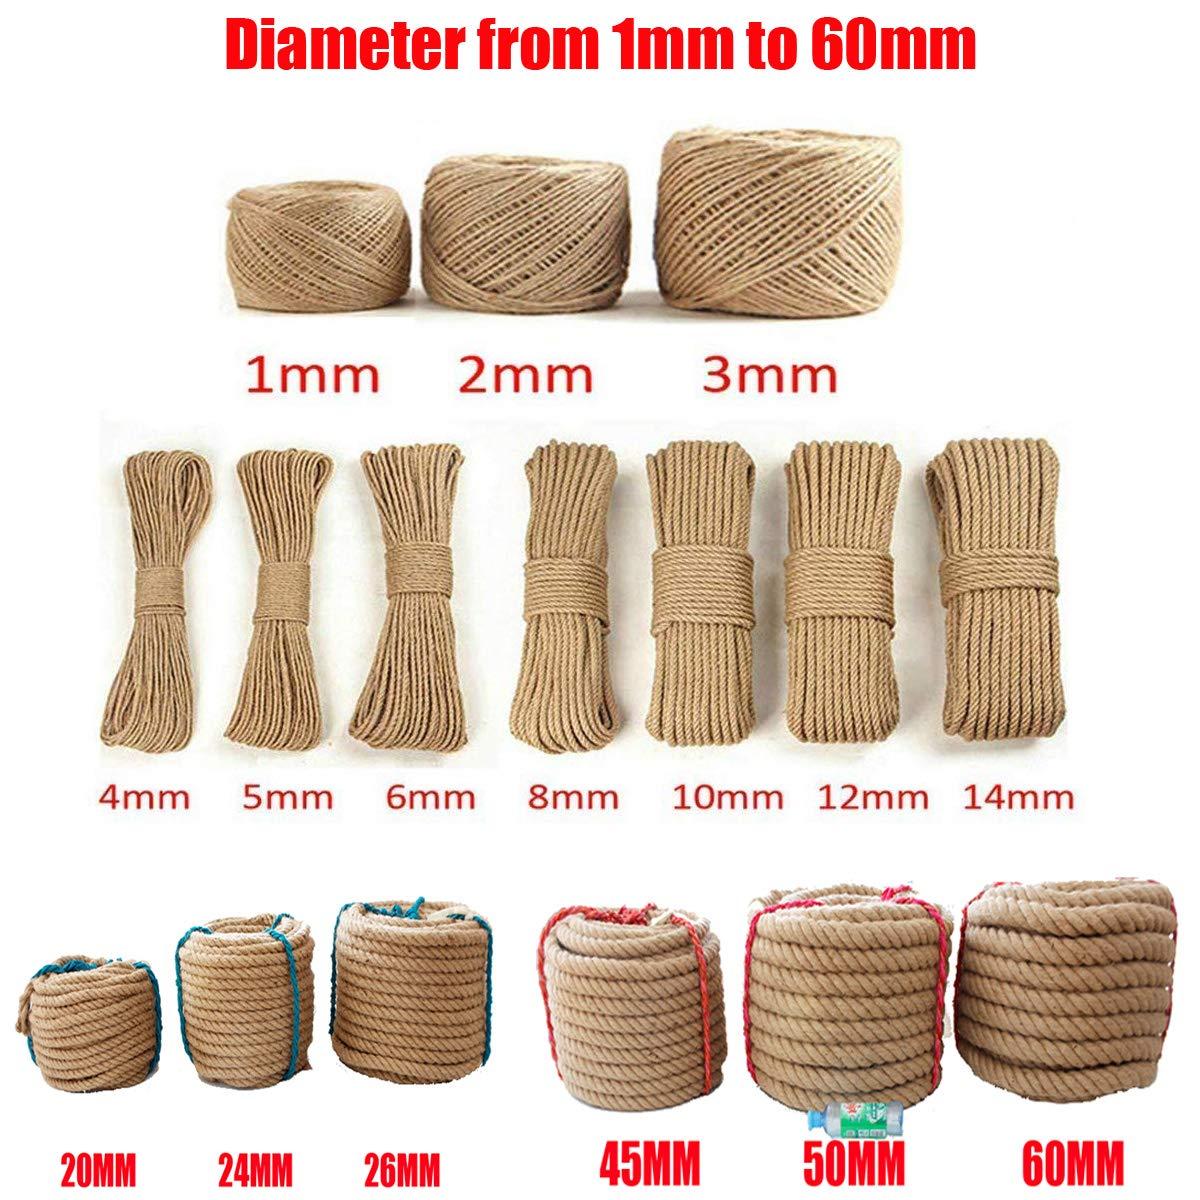 Yute cuerda 100/% Natural 20/m///ø5/mm 10/mm 15/mm 20/mm 25/mm 30/mm 35/mm 40/mm 45/mm 50/mm